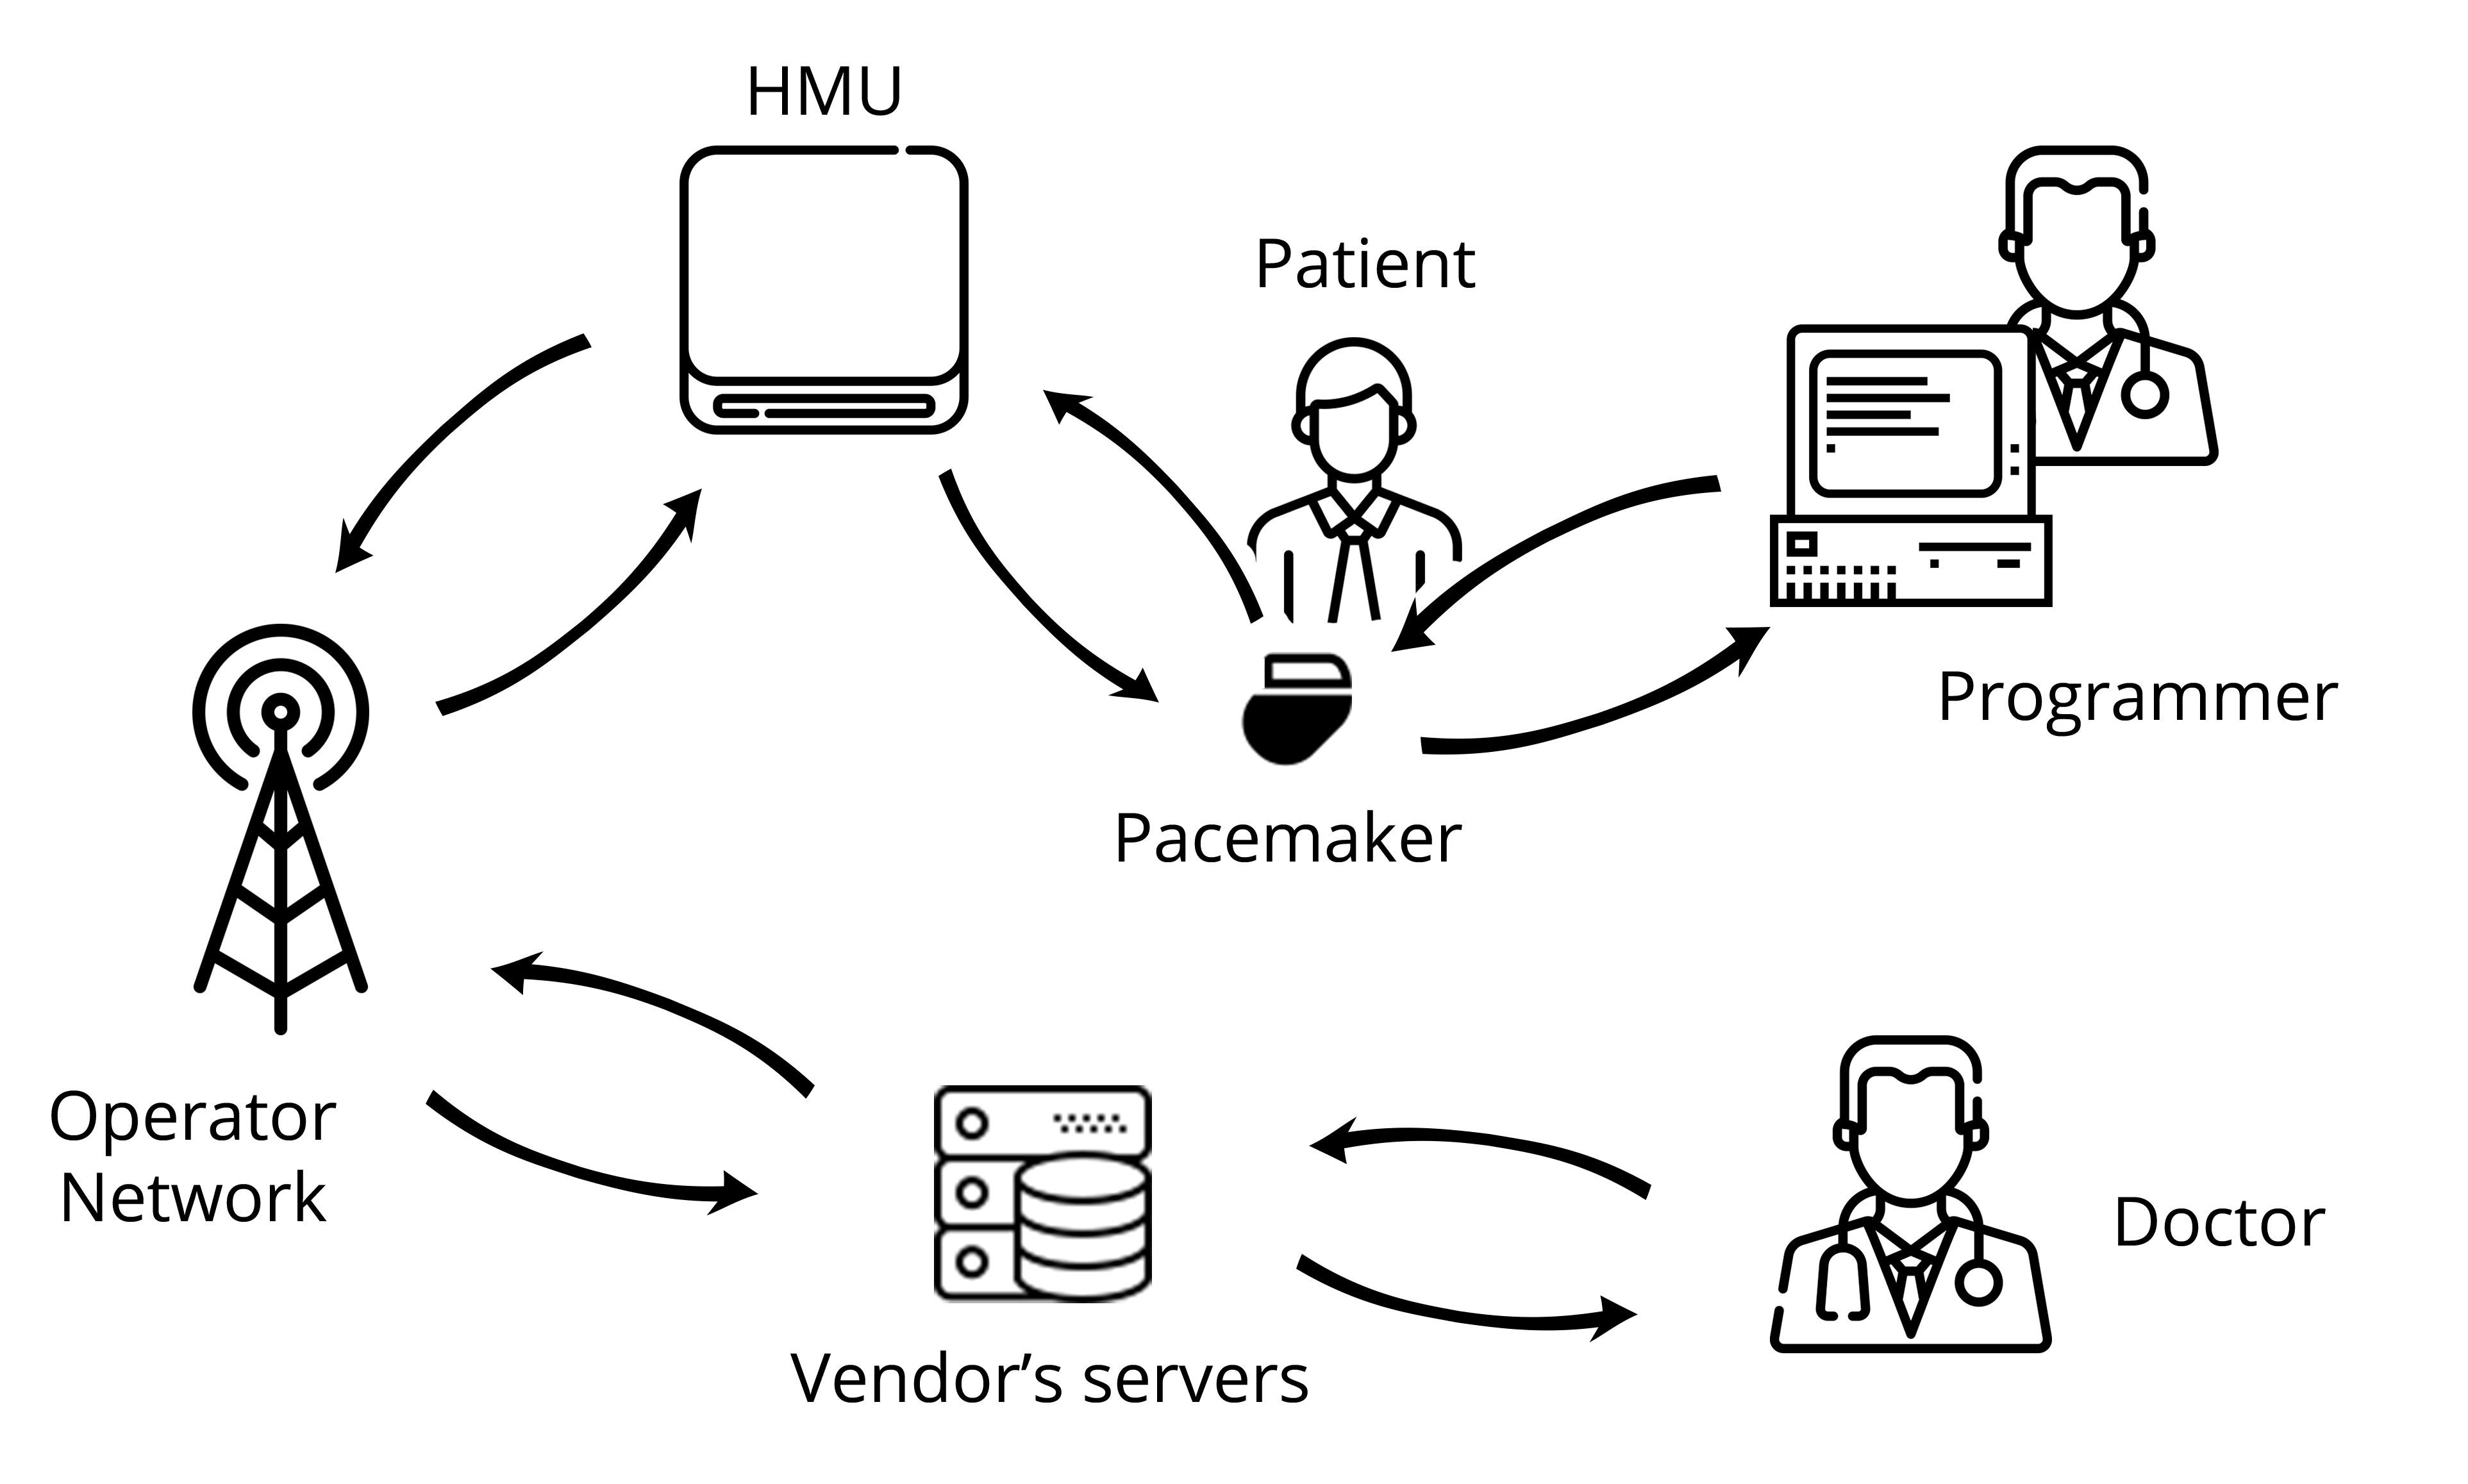 Figure 2: Diagram of the vendor's pacemaker ecosystem